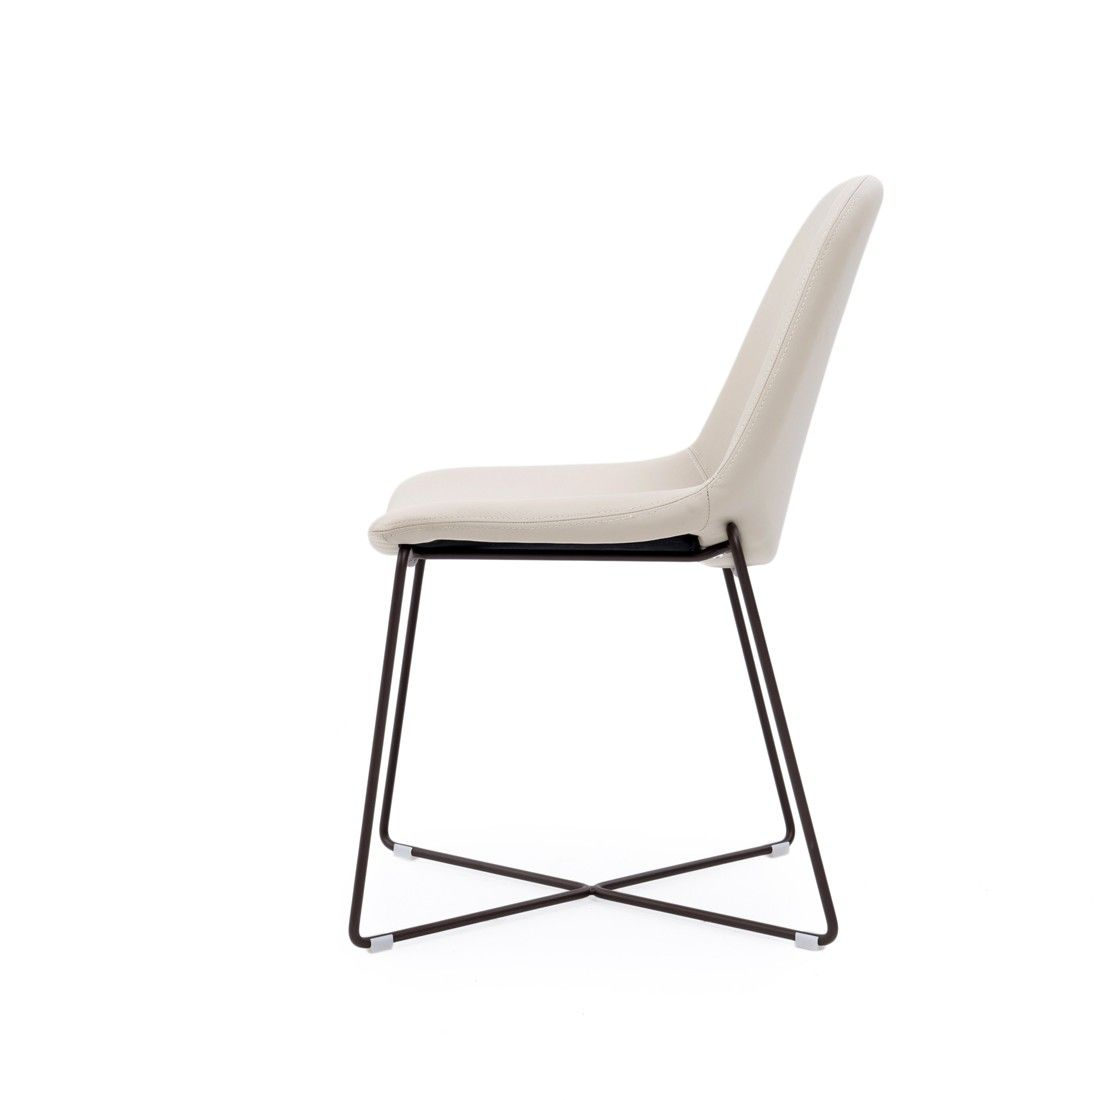 Seating Beige ECKO